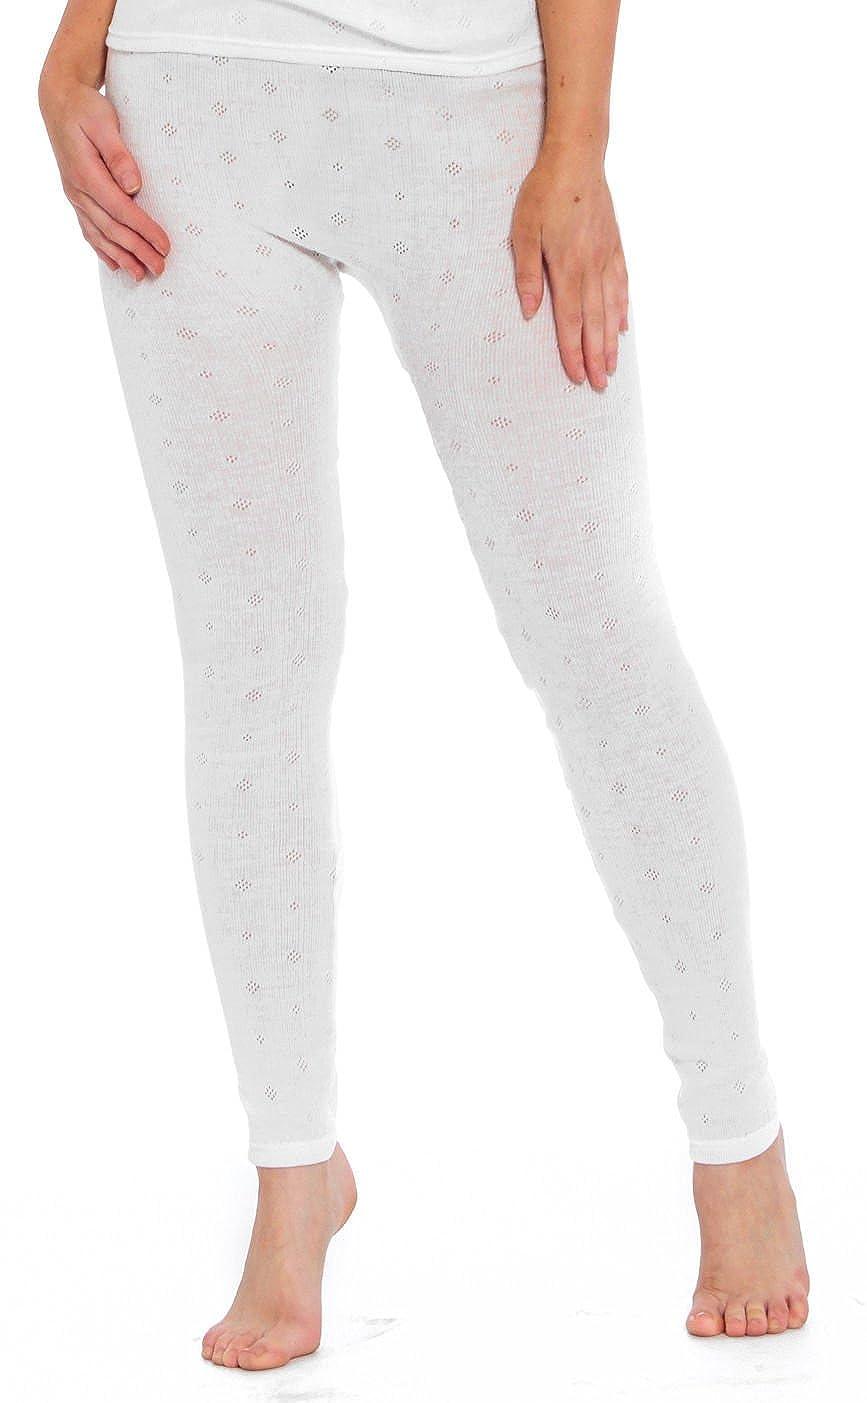 Ladies Thermal Leggings Woven Lace Pants Black White Size 8 10 12 14 16 18 20 22